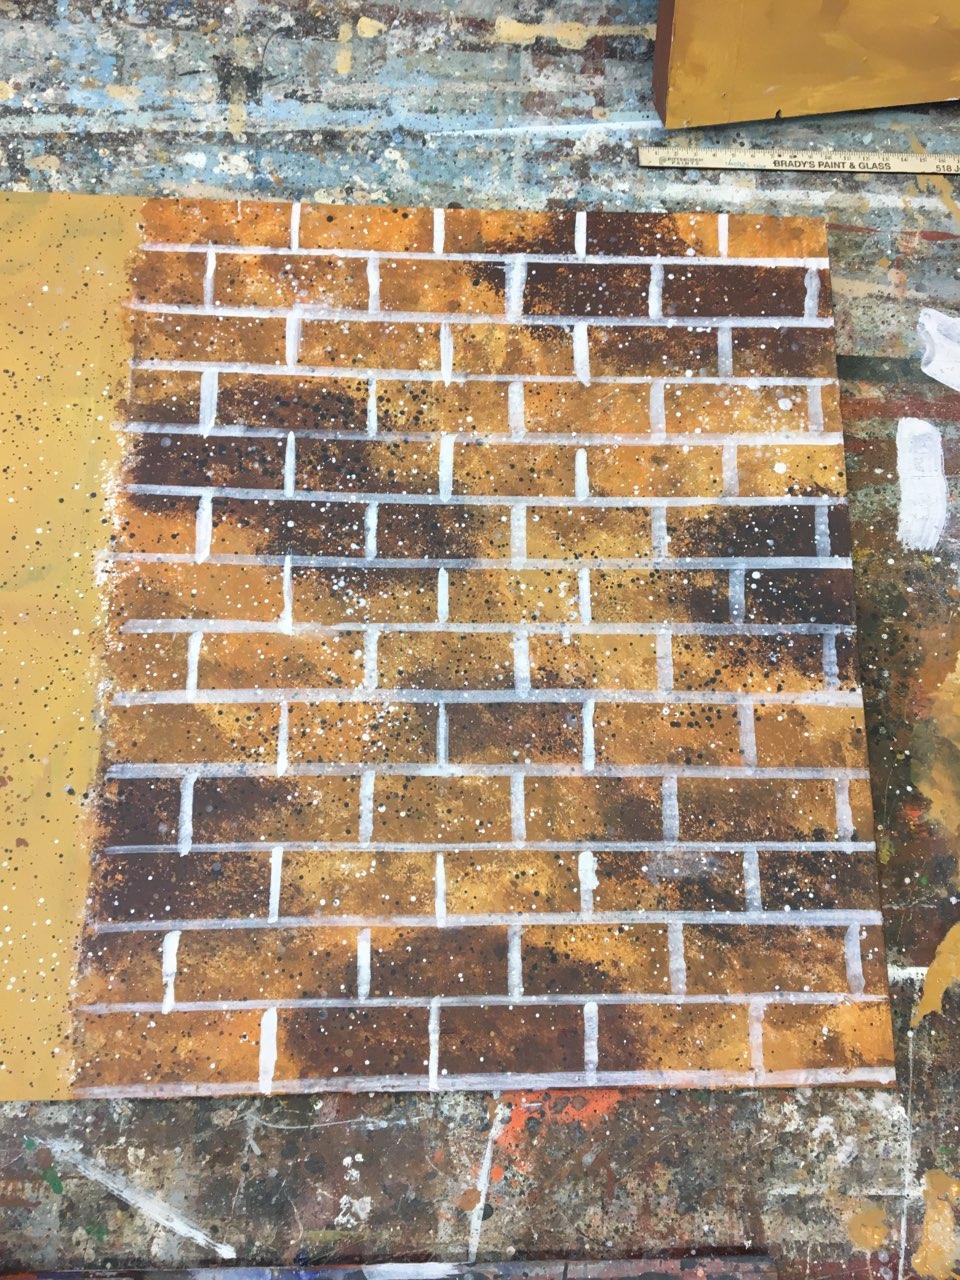 Bricks pt. 2